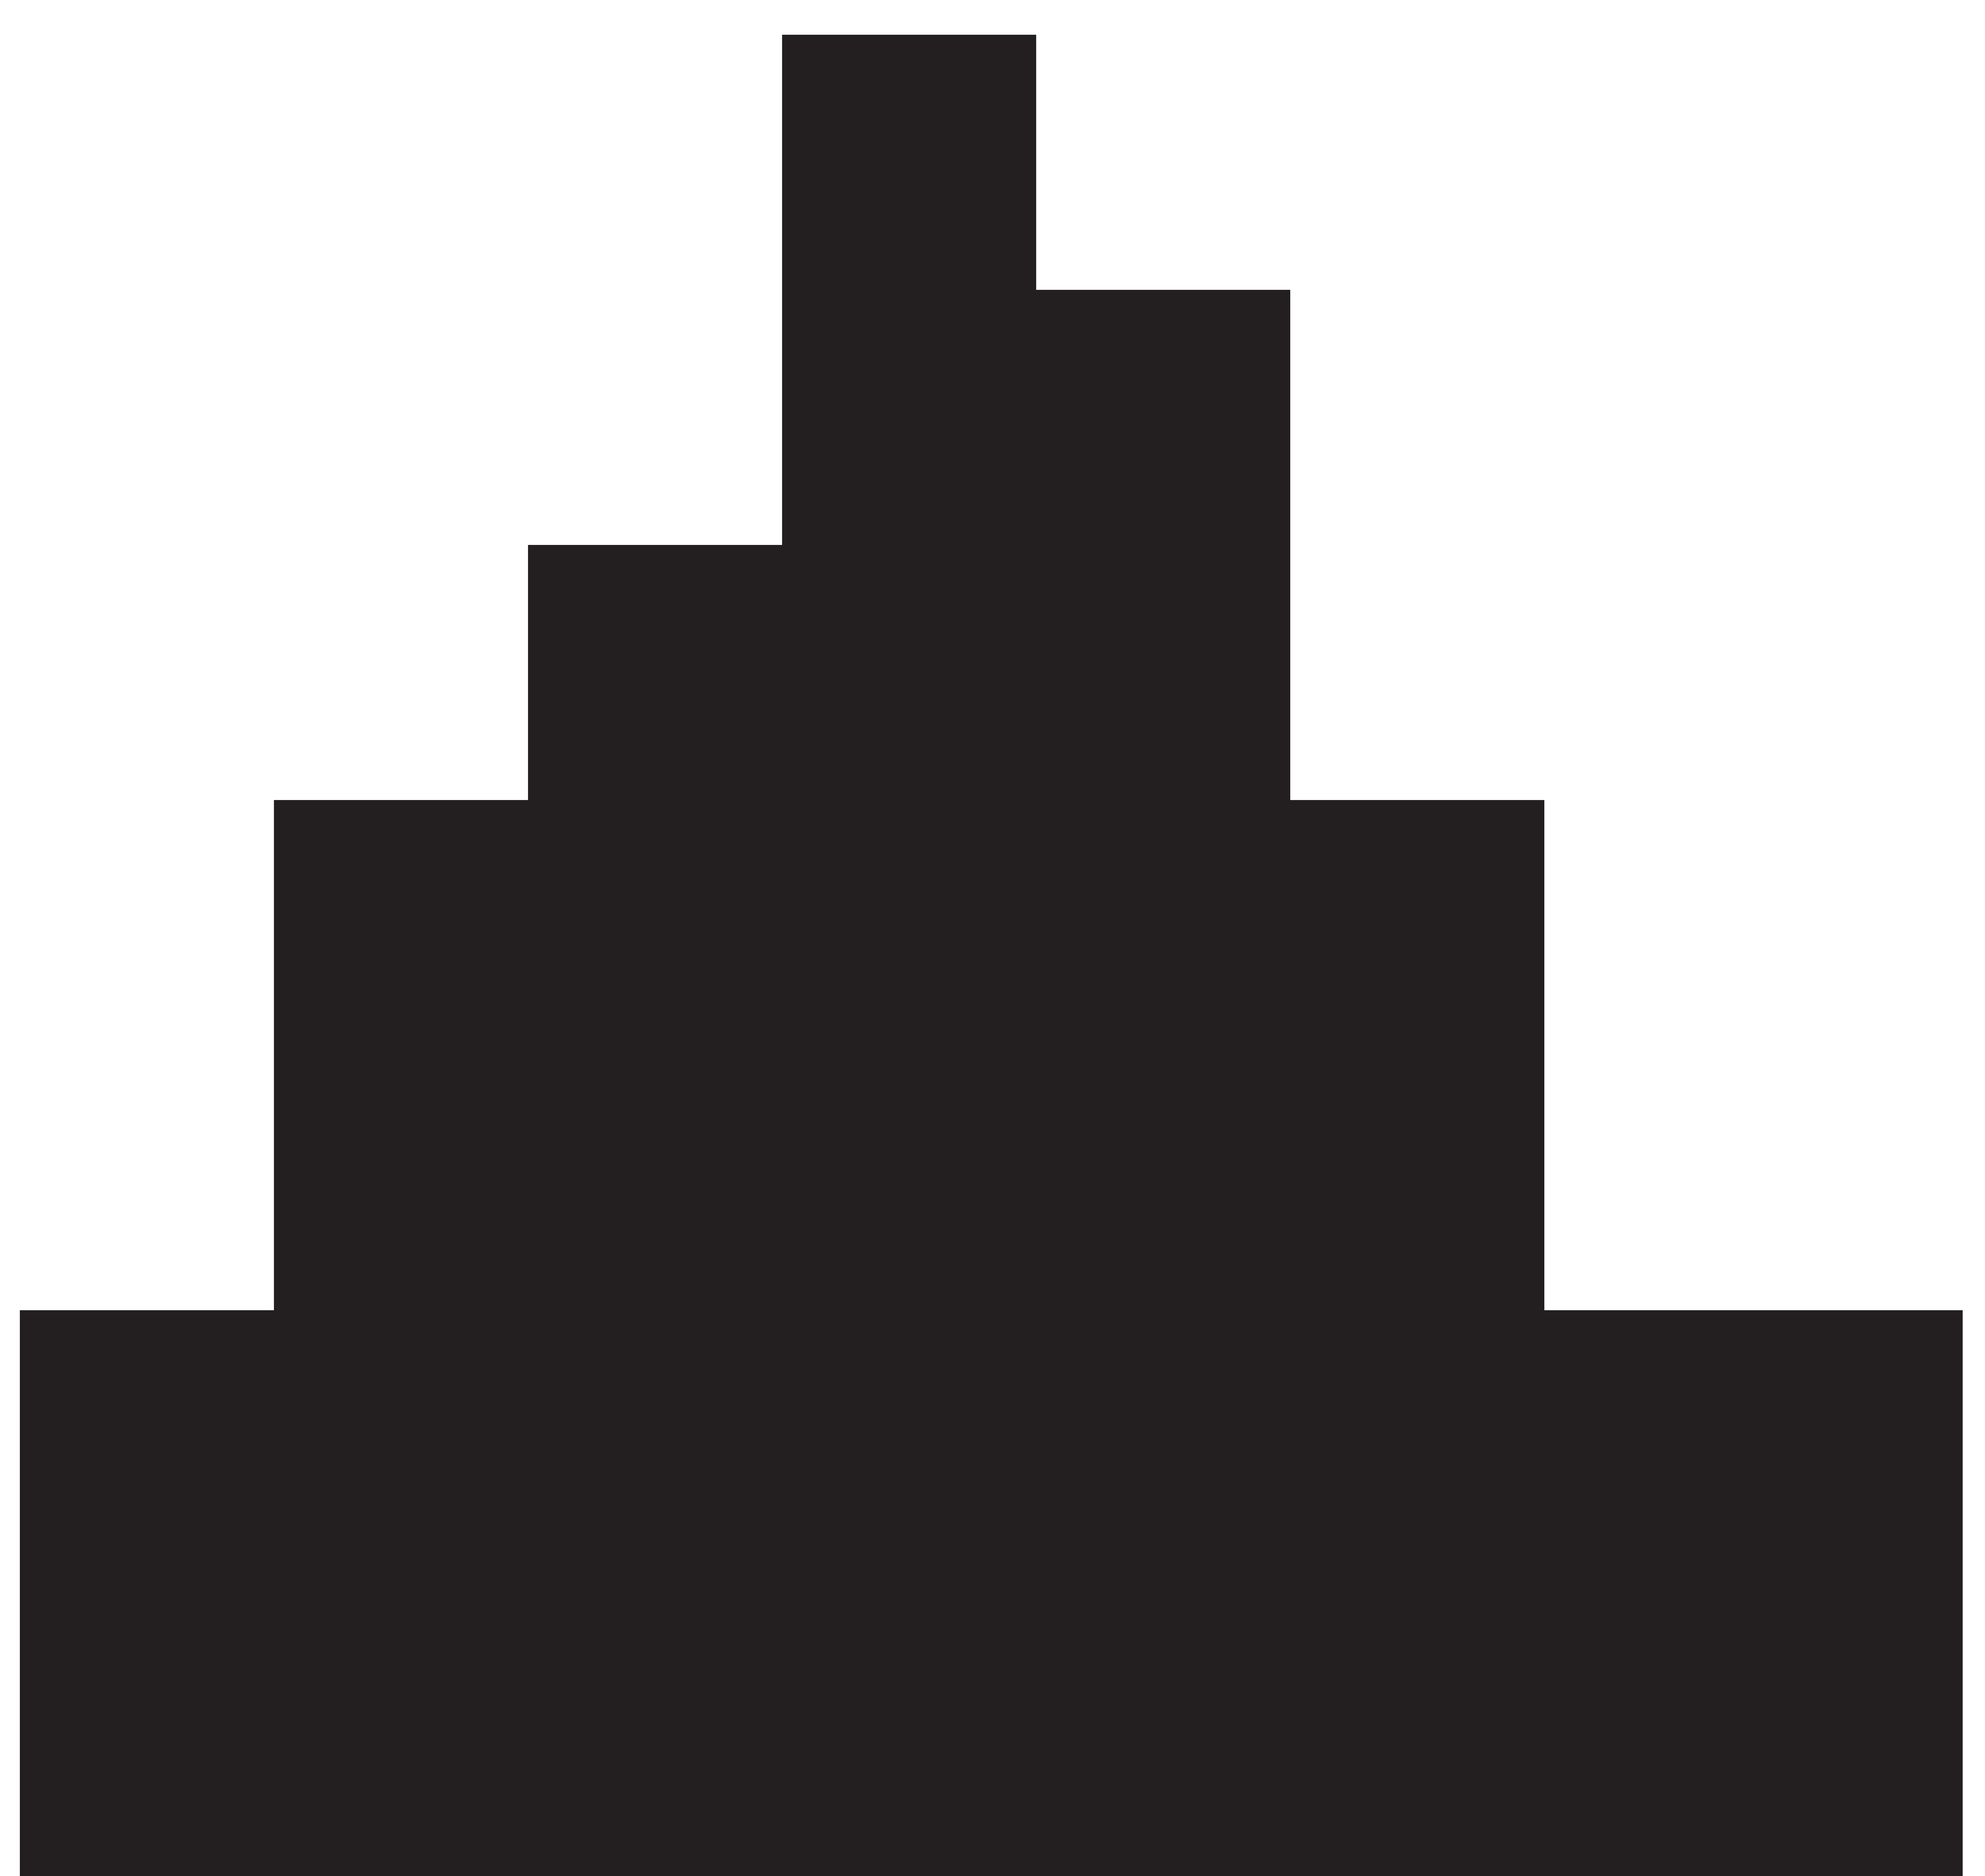 8000x7560 Black Buddha Silhouette Png Clip Art